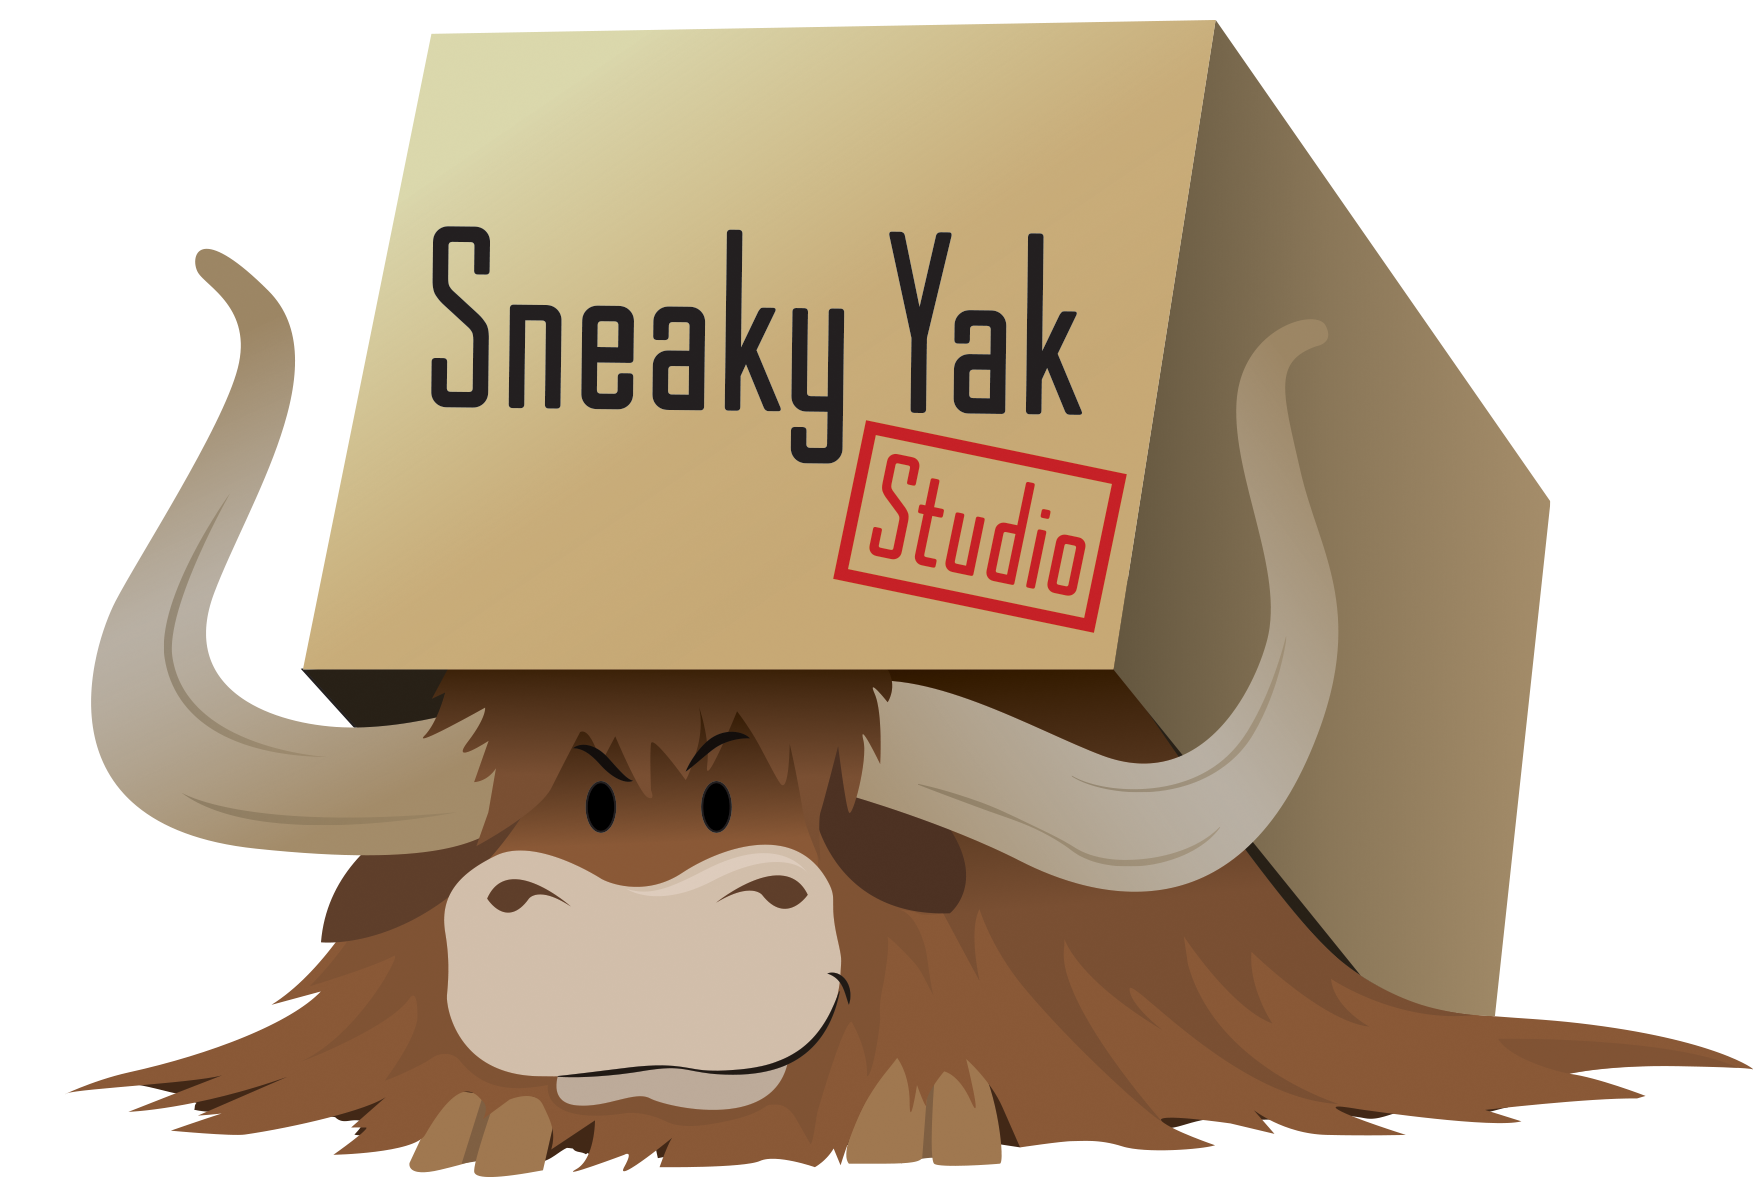 Sneaky Yak Studio